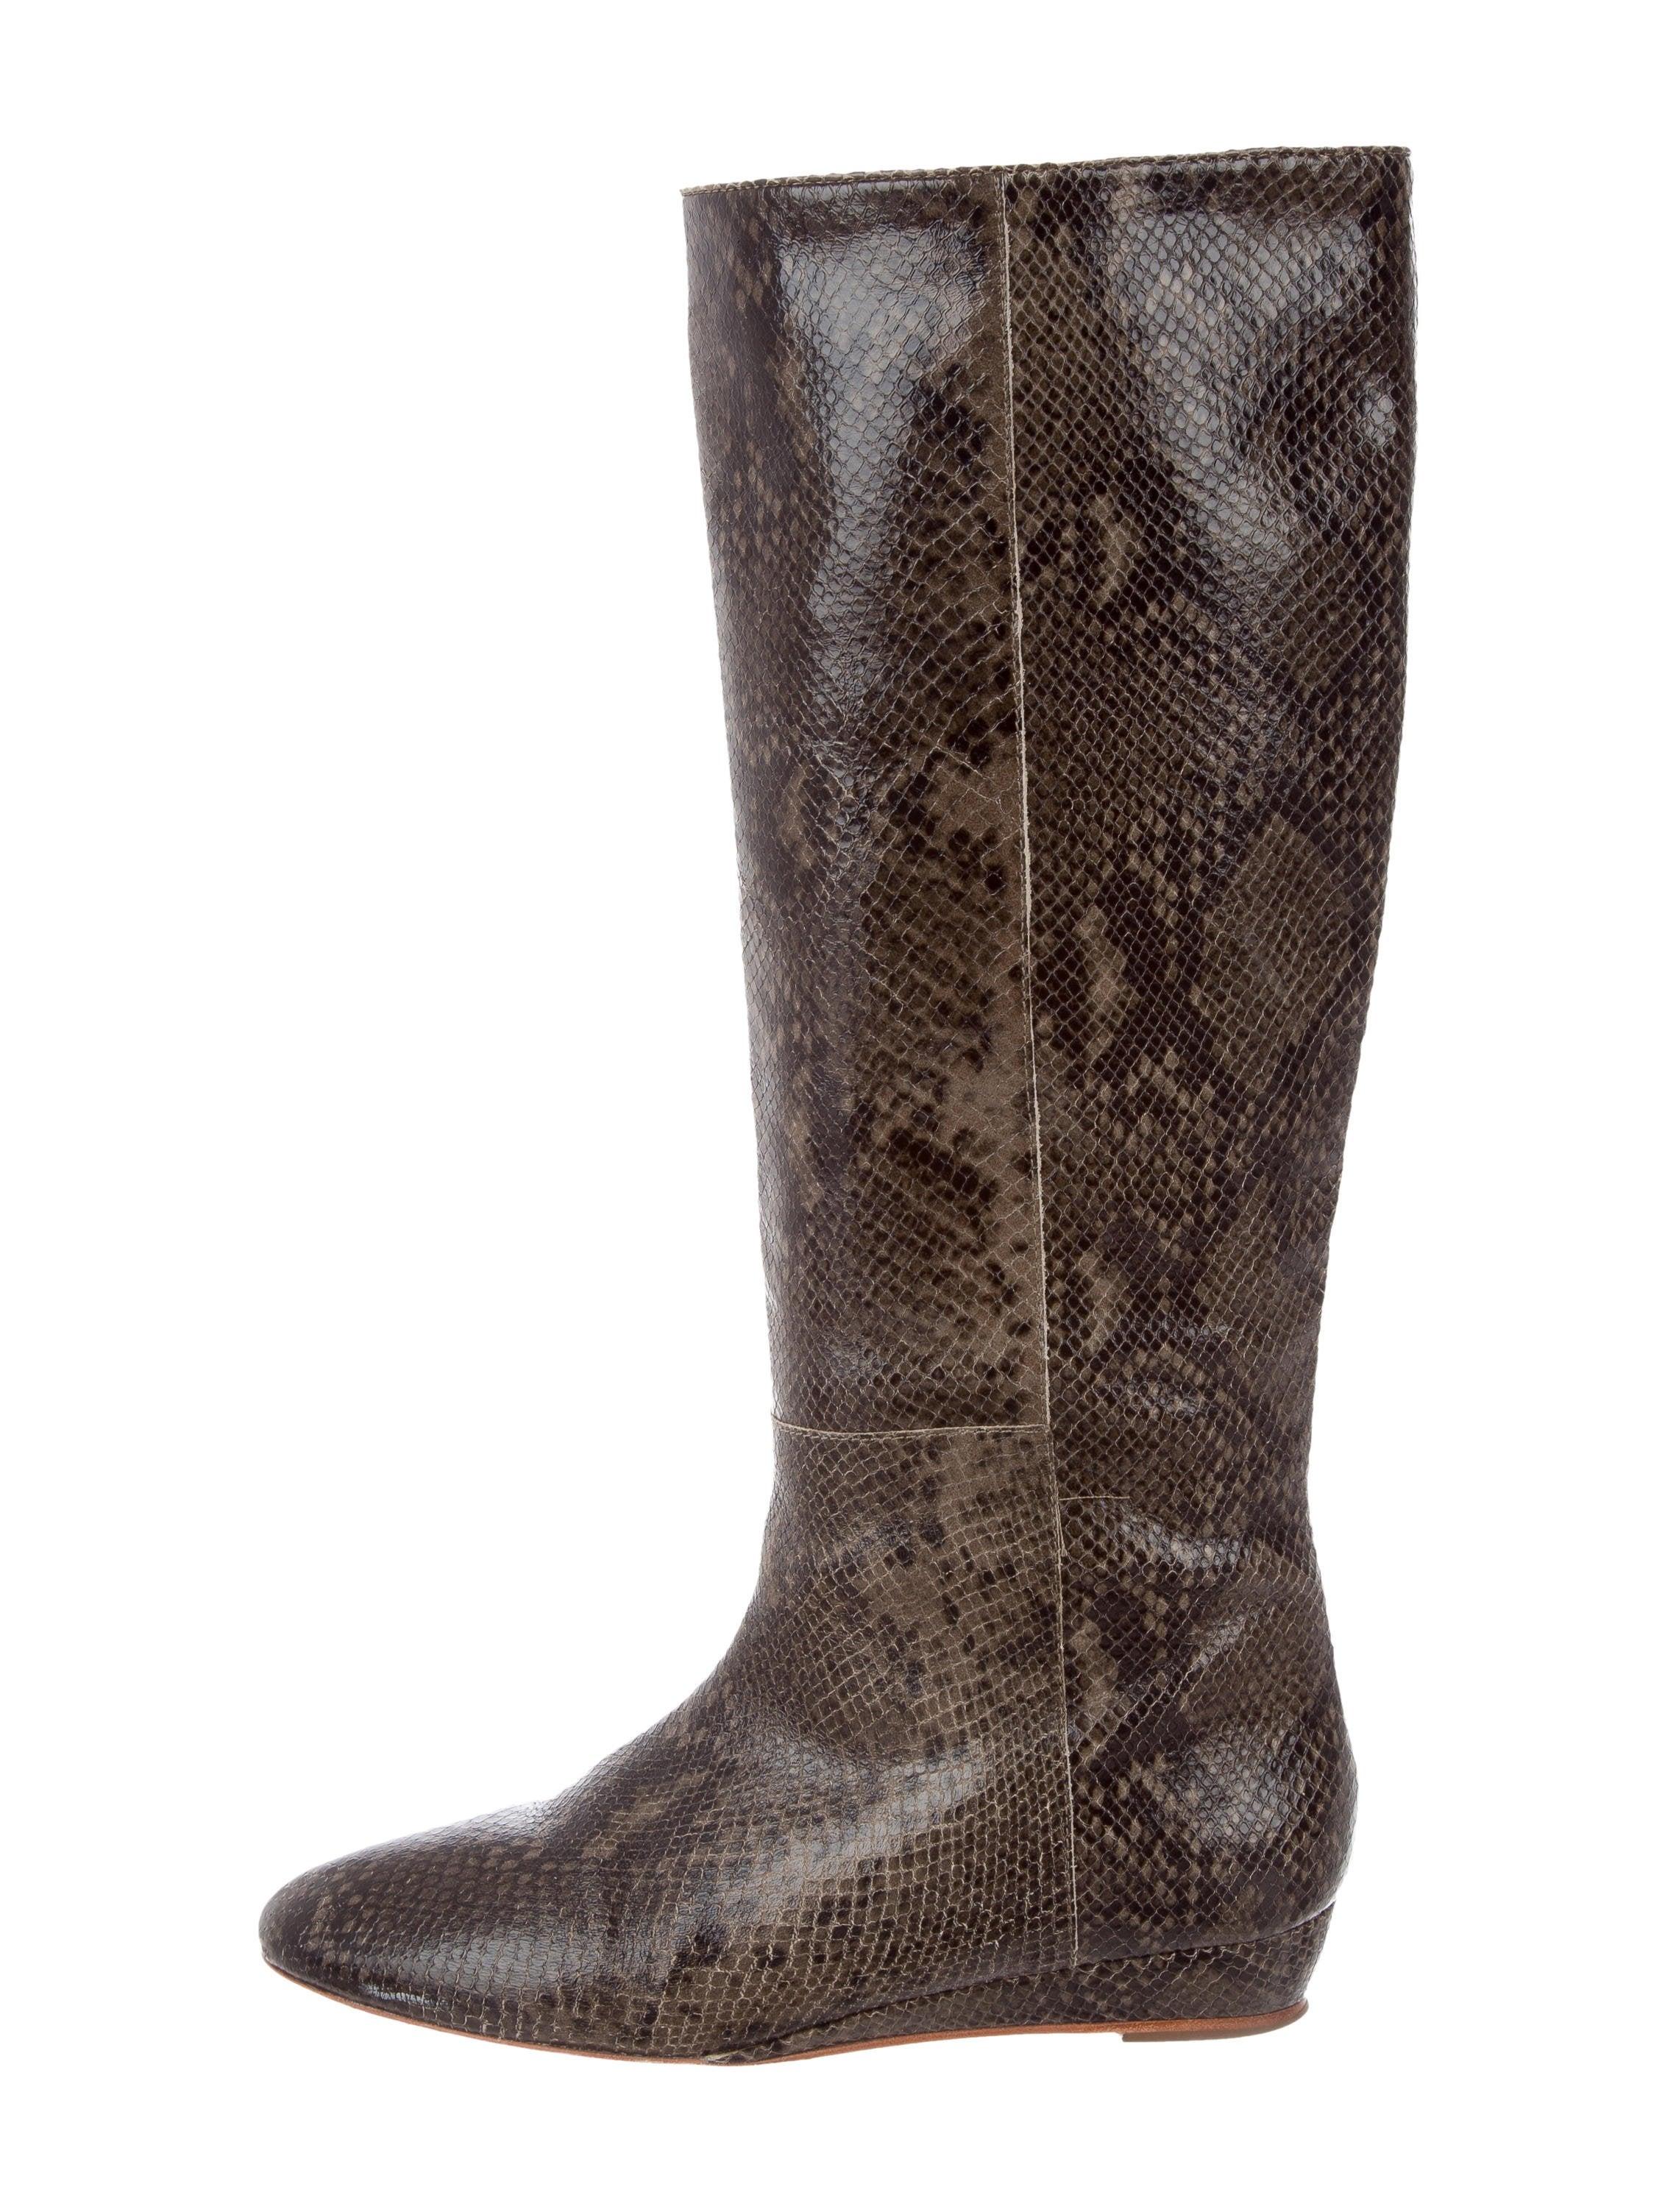 Loeffler Randall Embossed Wedge Boots free shipping sast latest cheap online GgLSLKG8